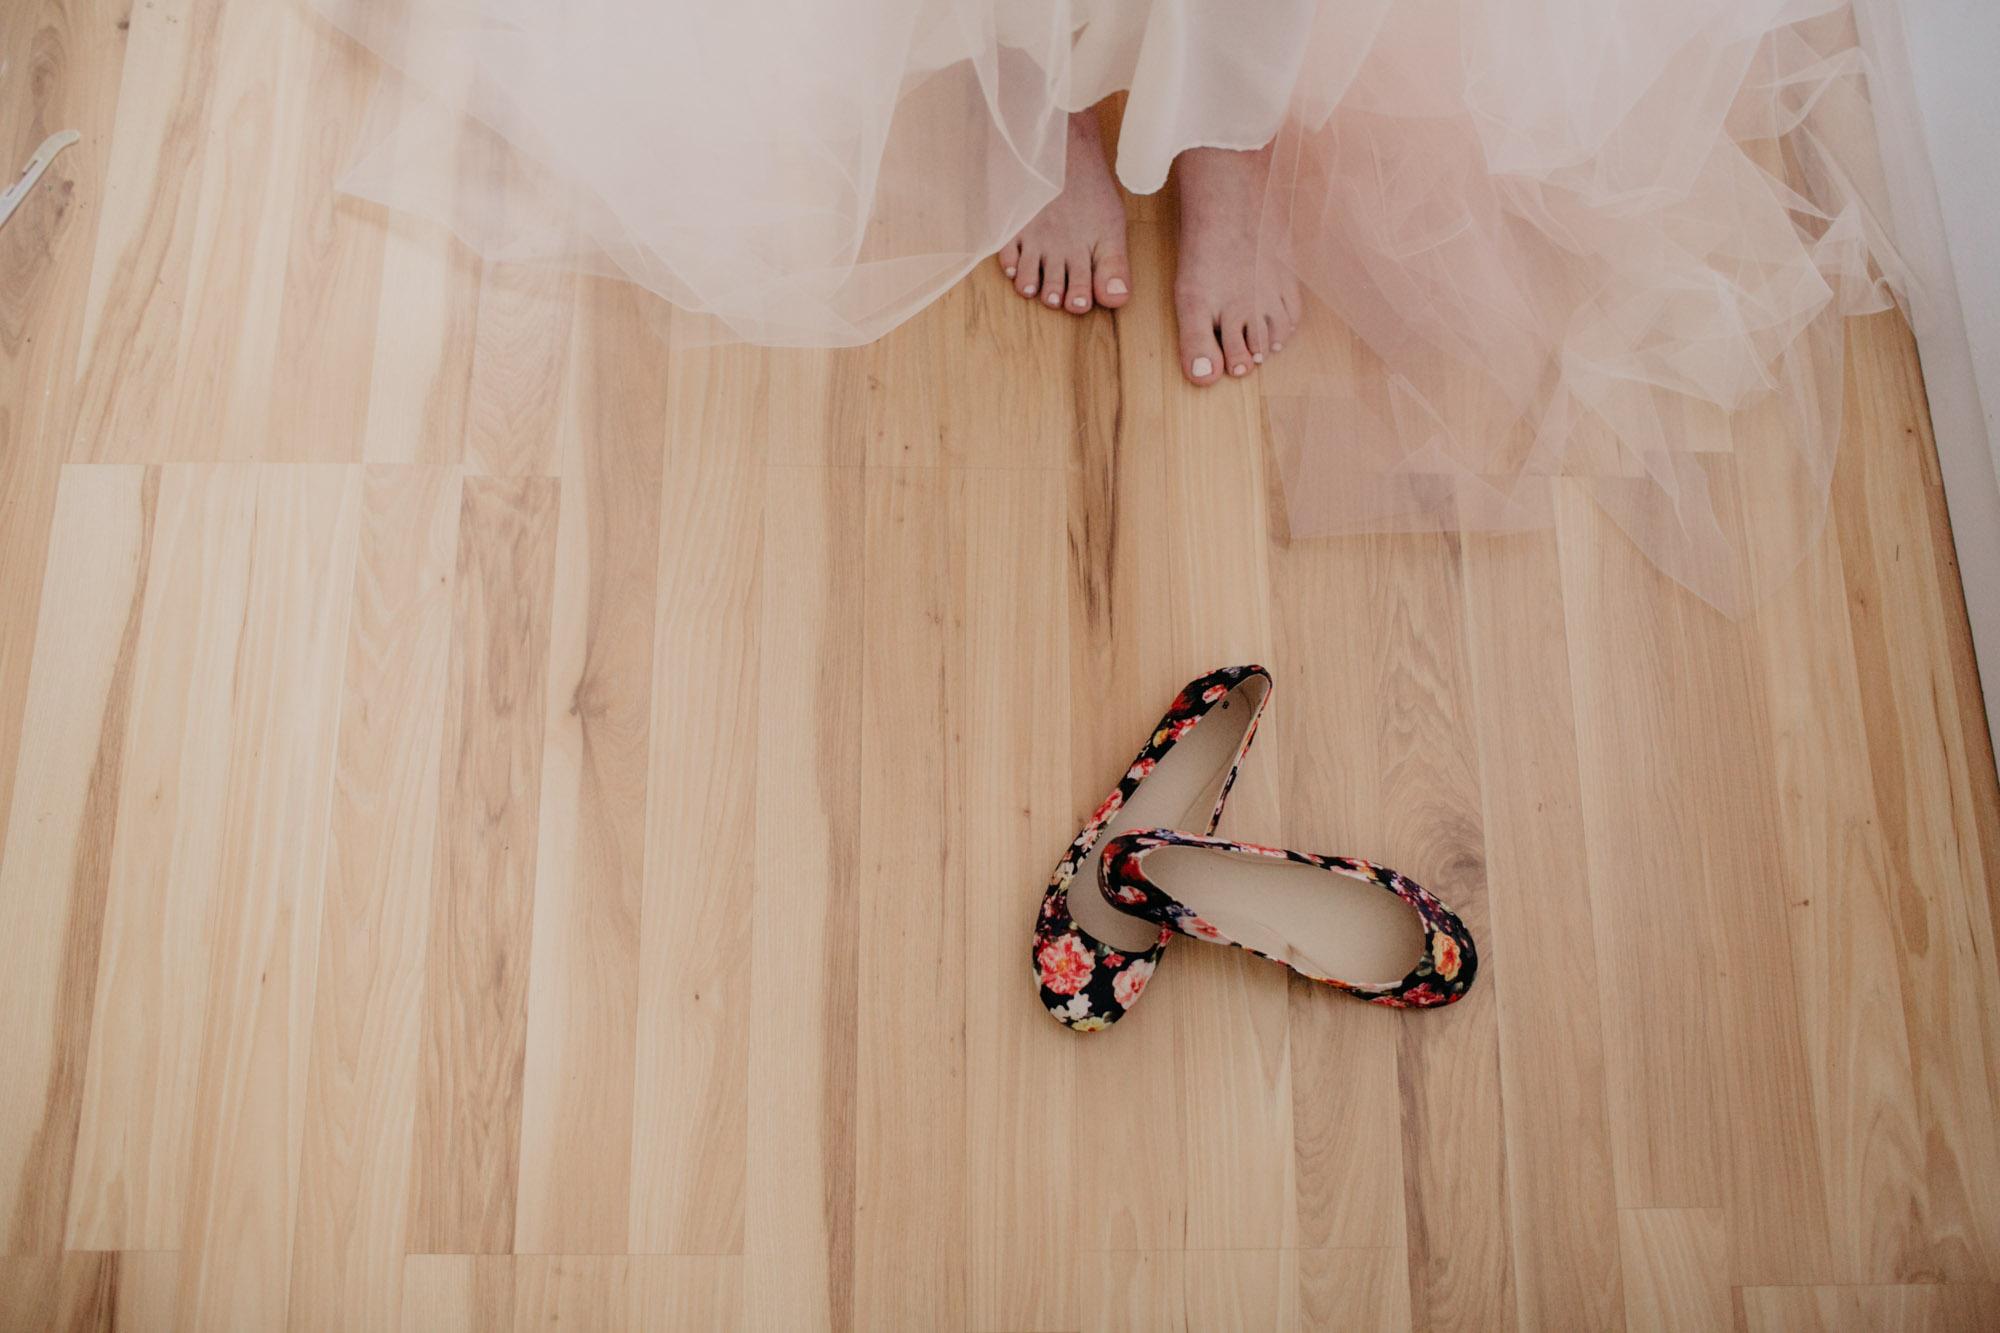 omaha-wedding-photographer-meghan-time-13.jpg